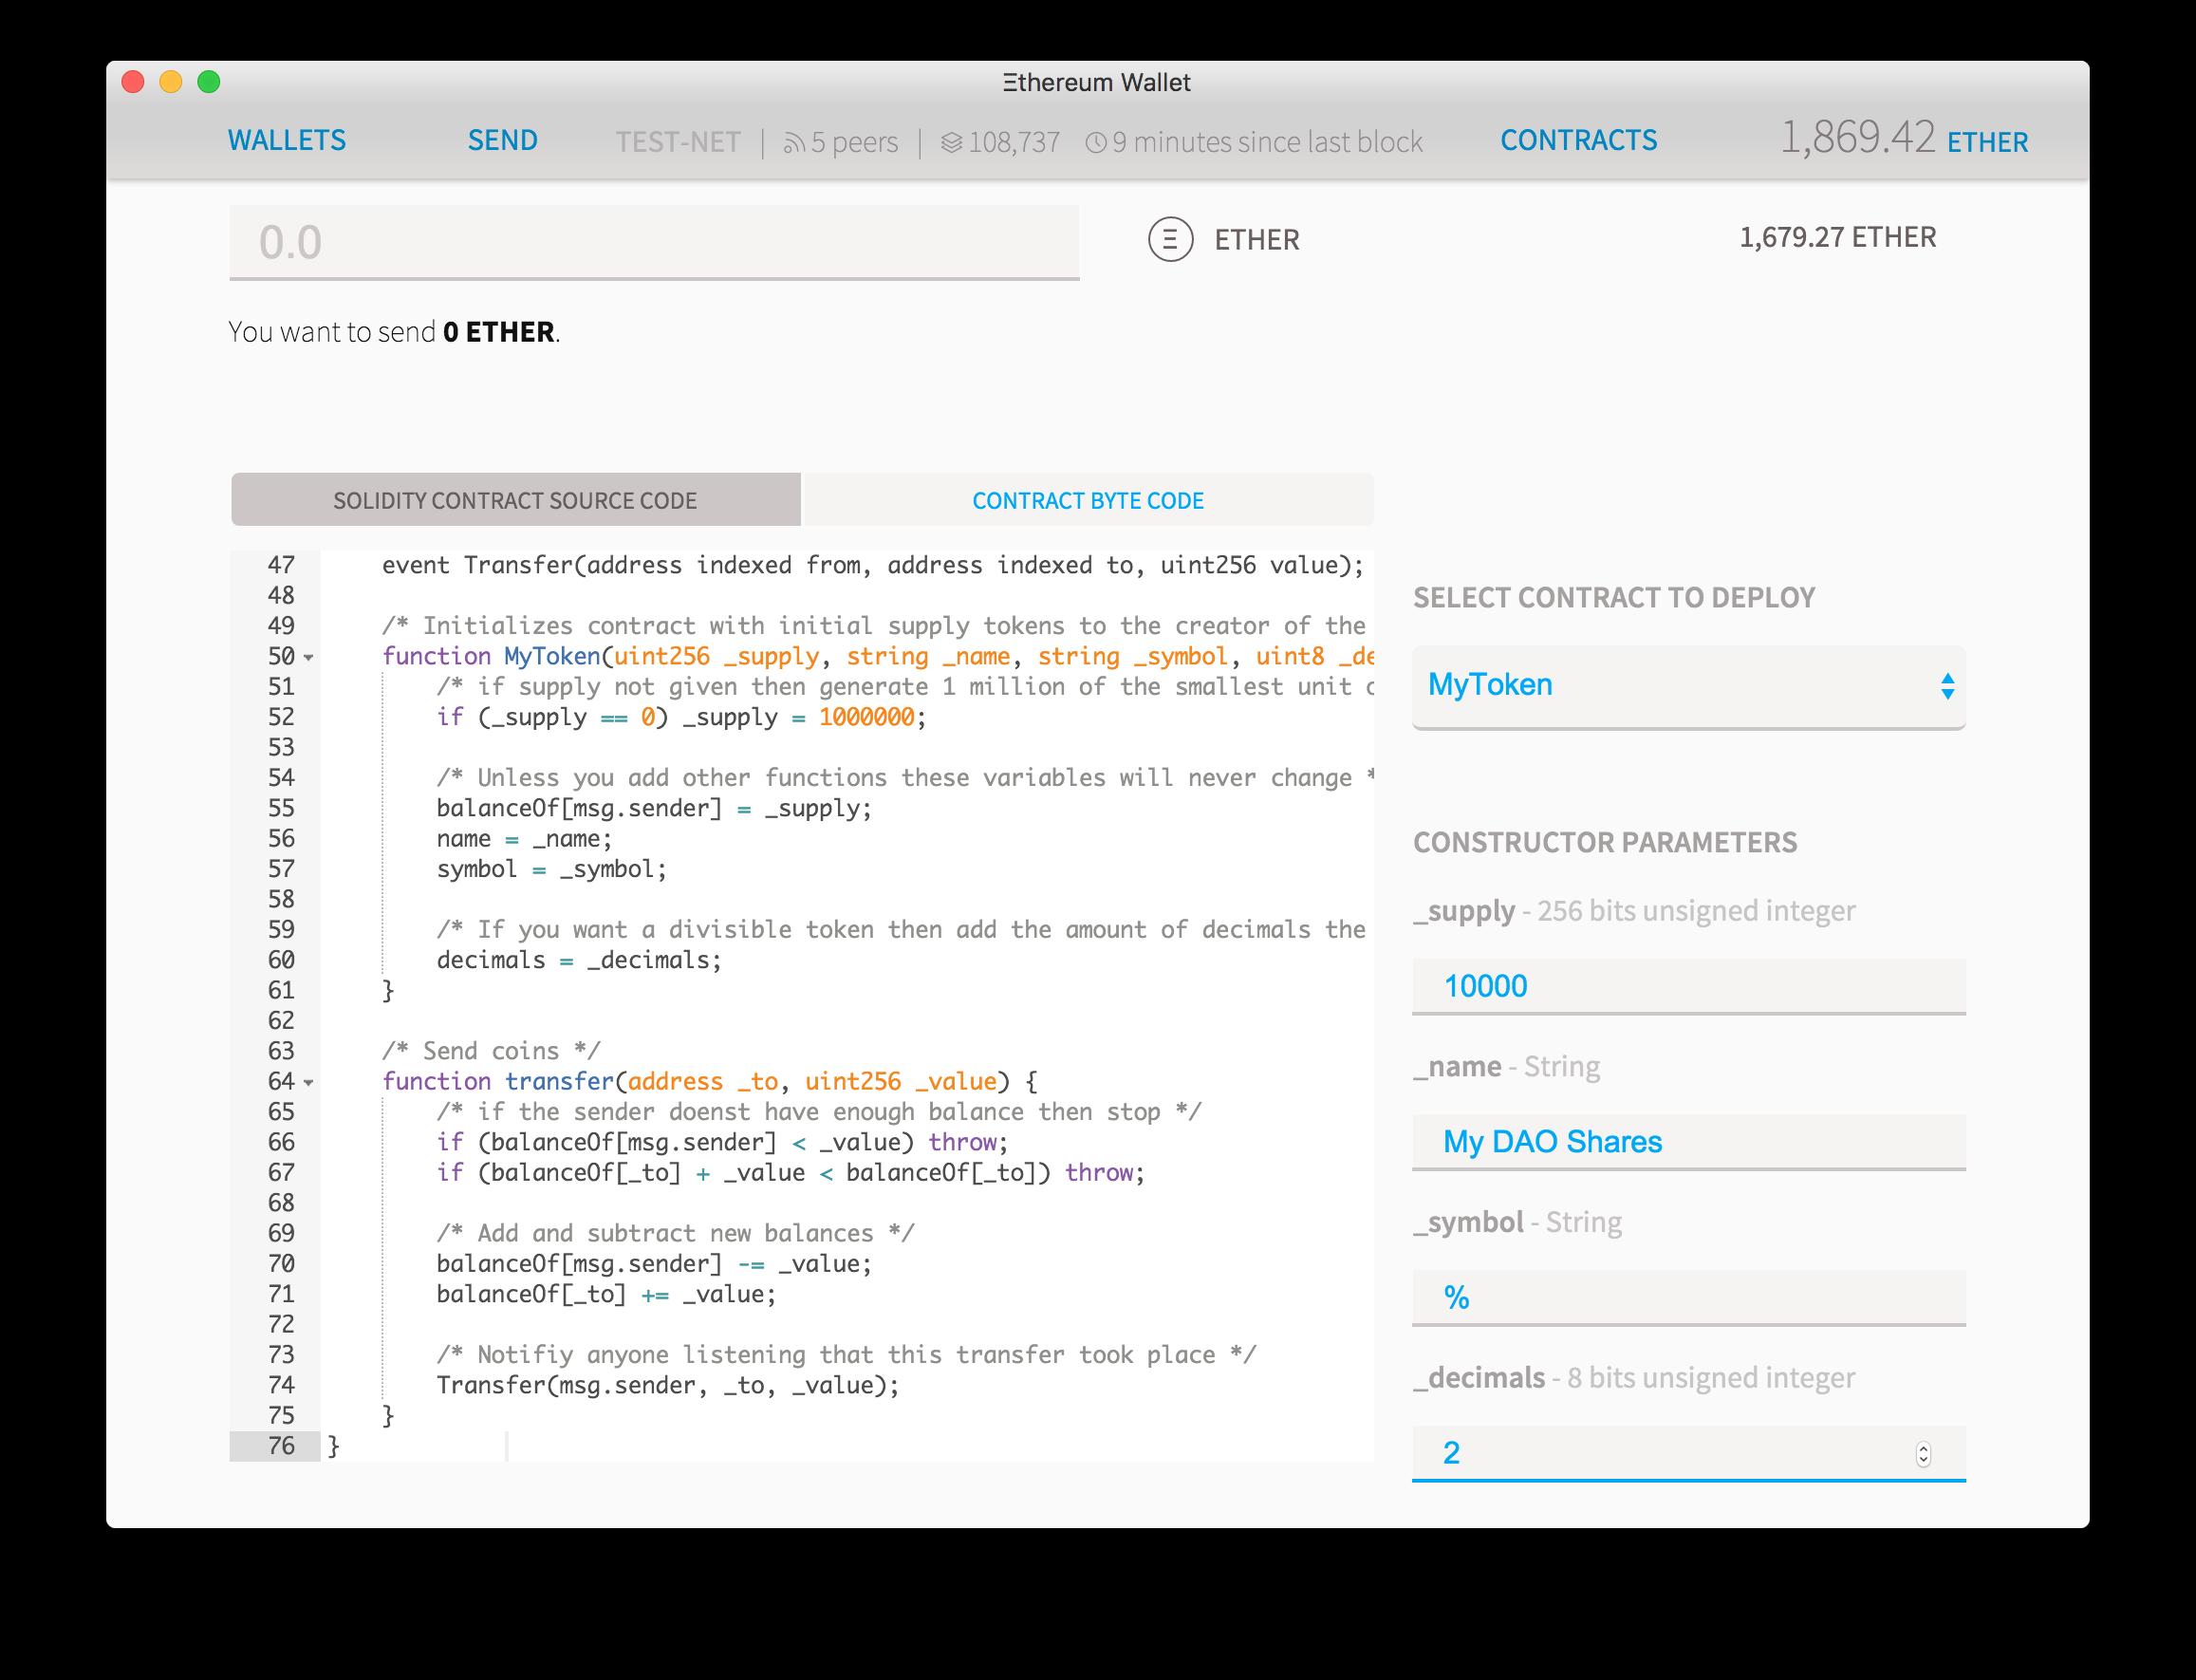 Ethereum-Wallet-Screenshot-2015-12-03-at-3.50.36-PM-10.png